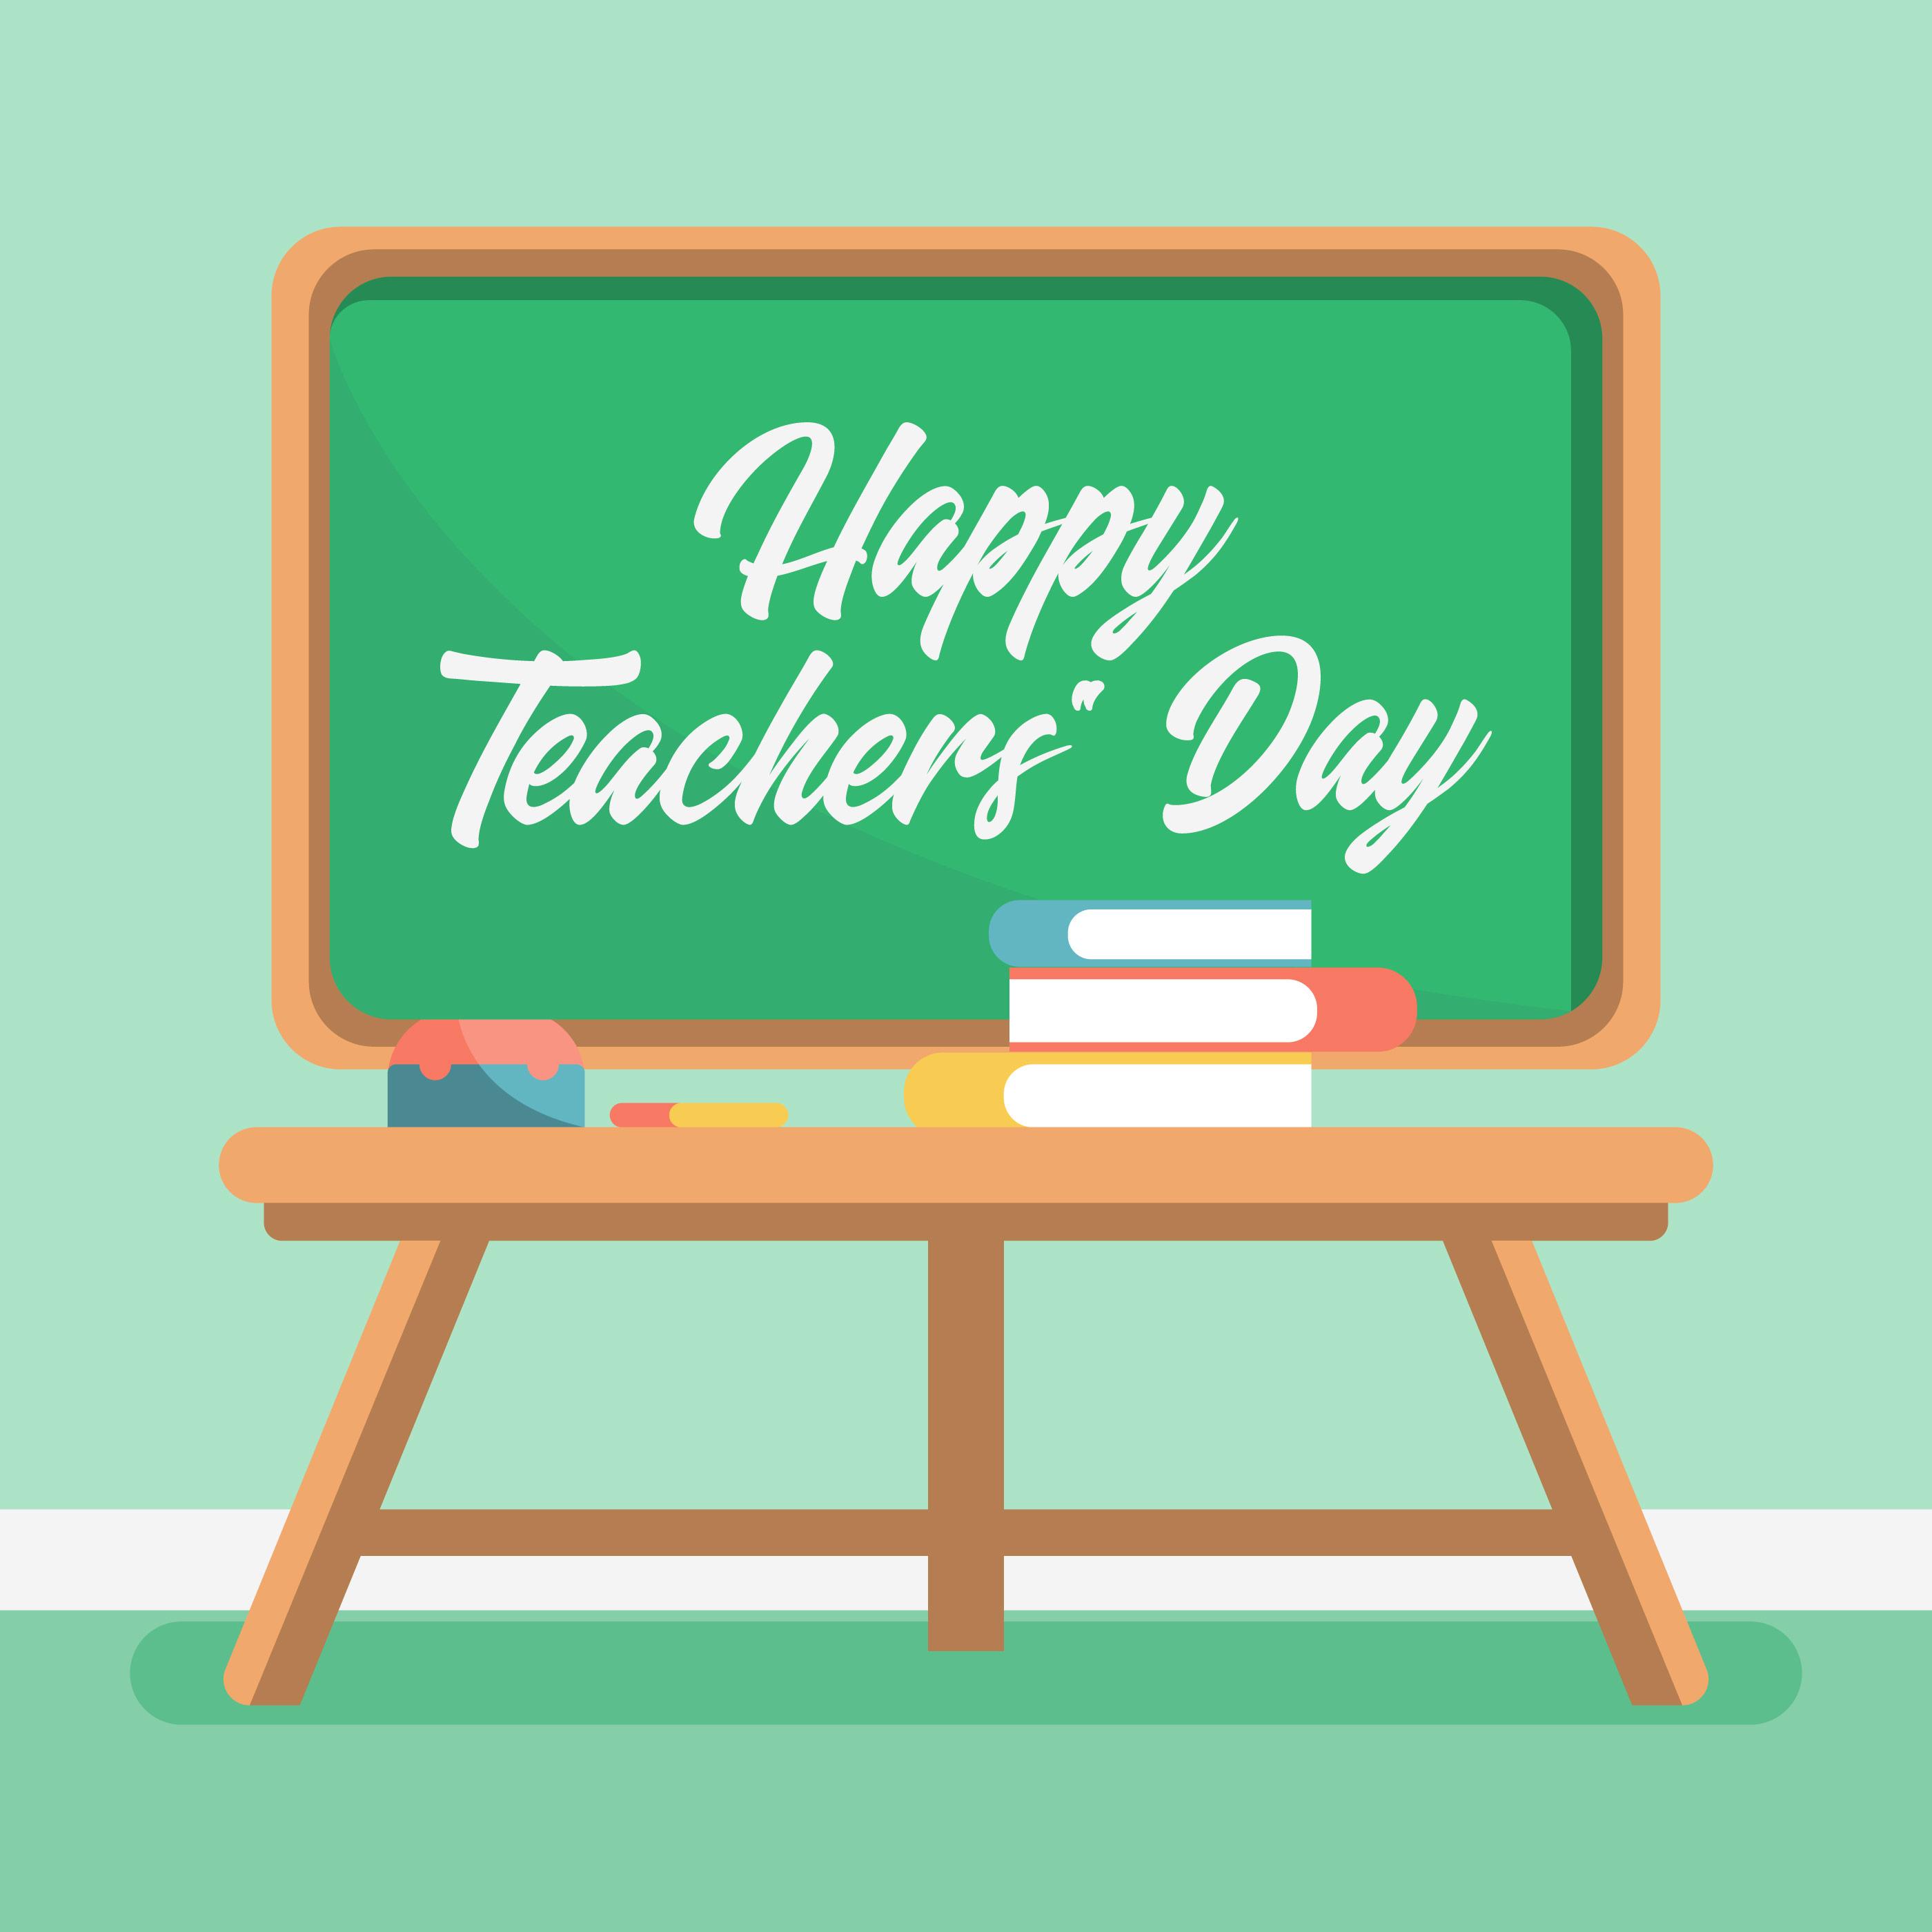 Happy Teachers Day Illustration